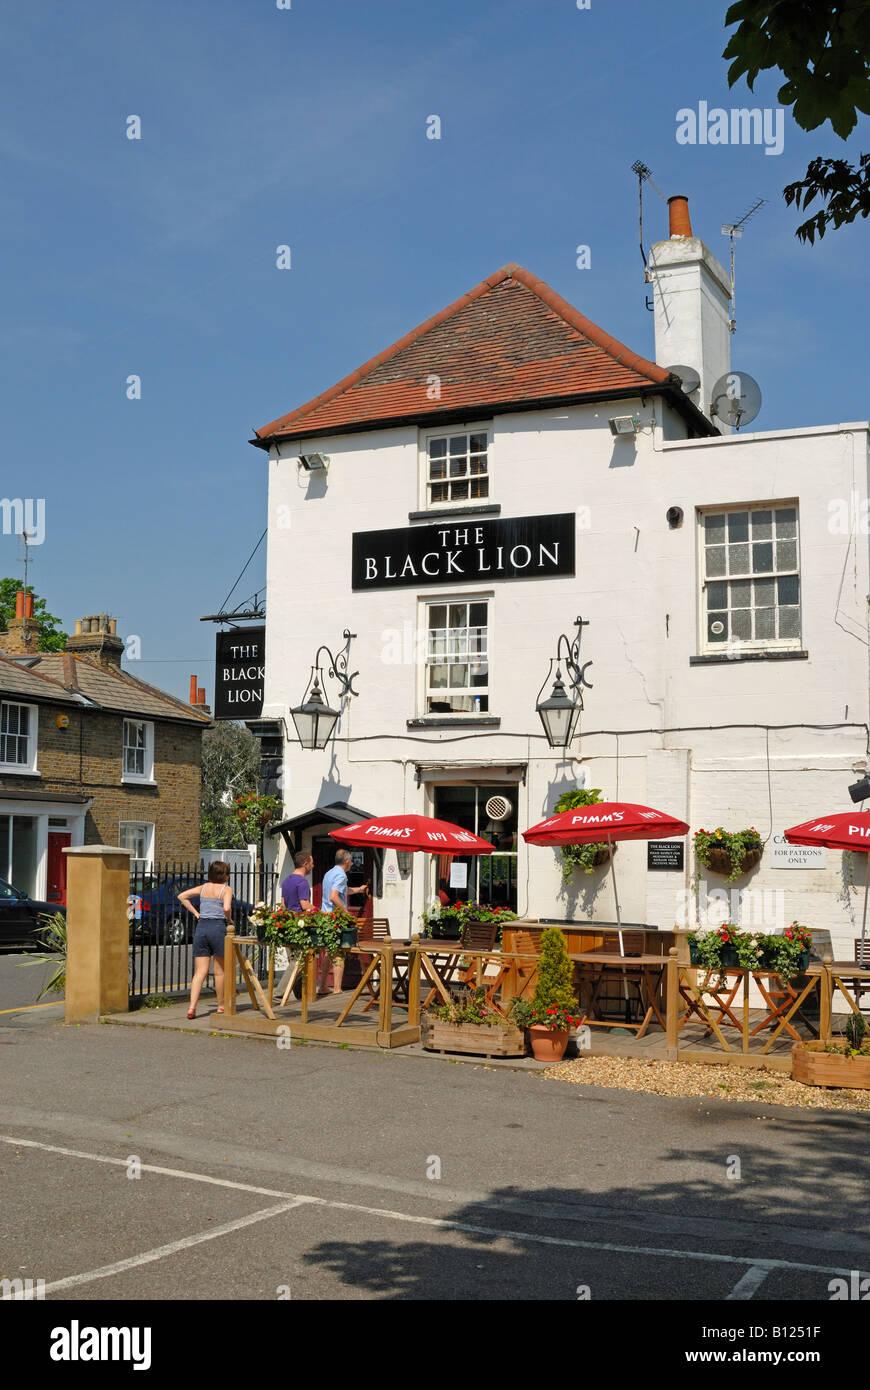 The Black Lion pub, Chiswick riverside - Stock Image